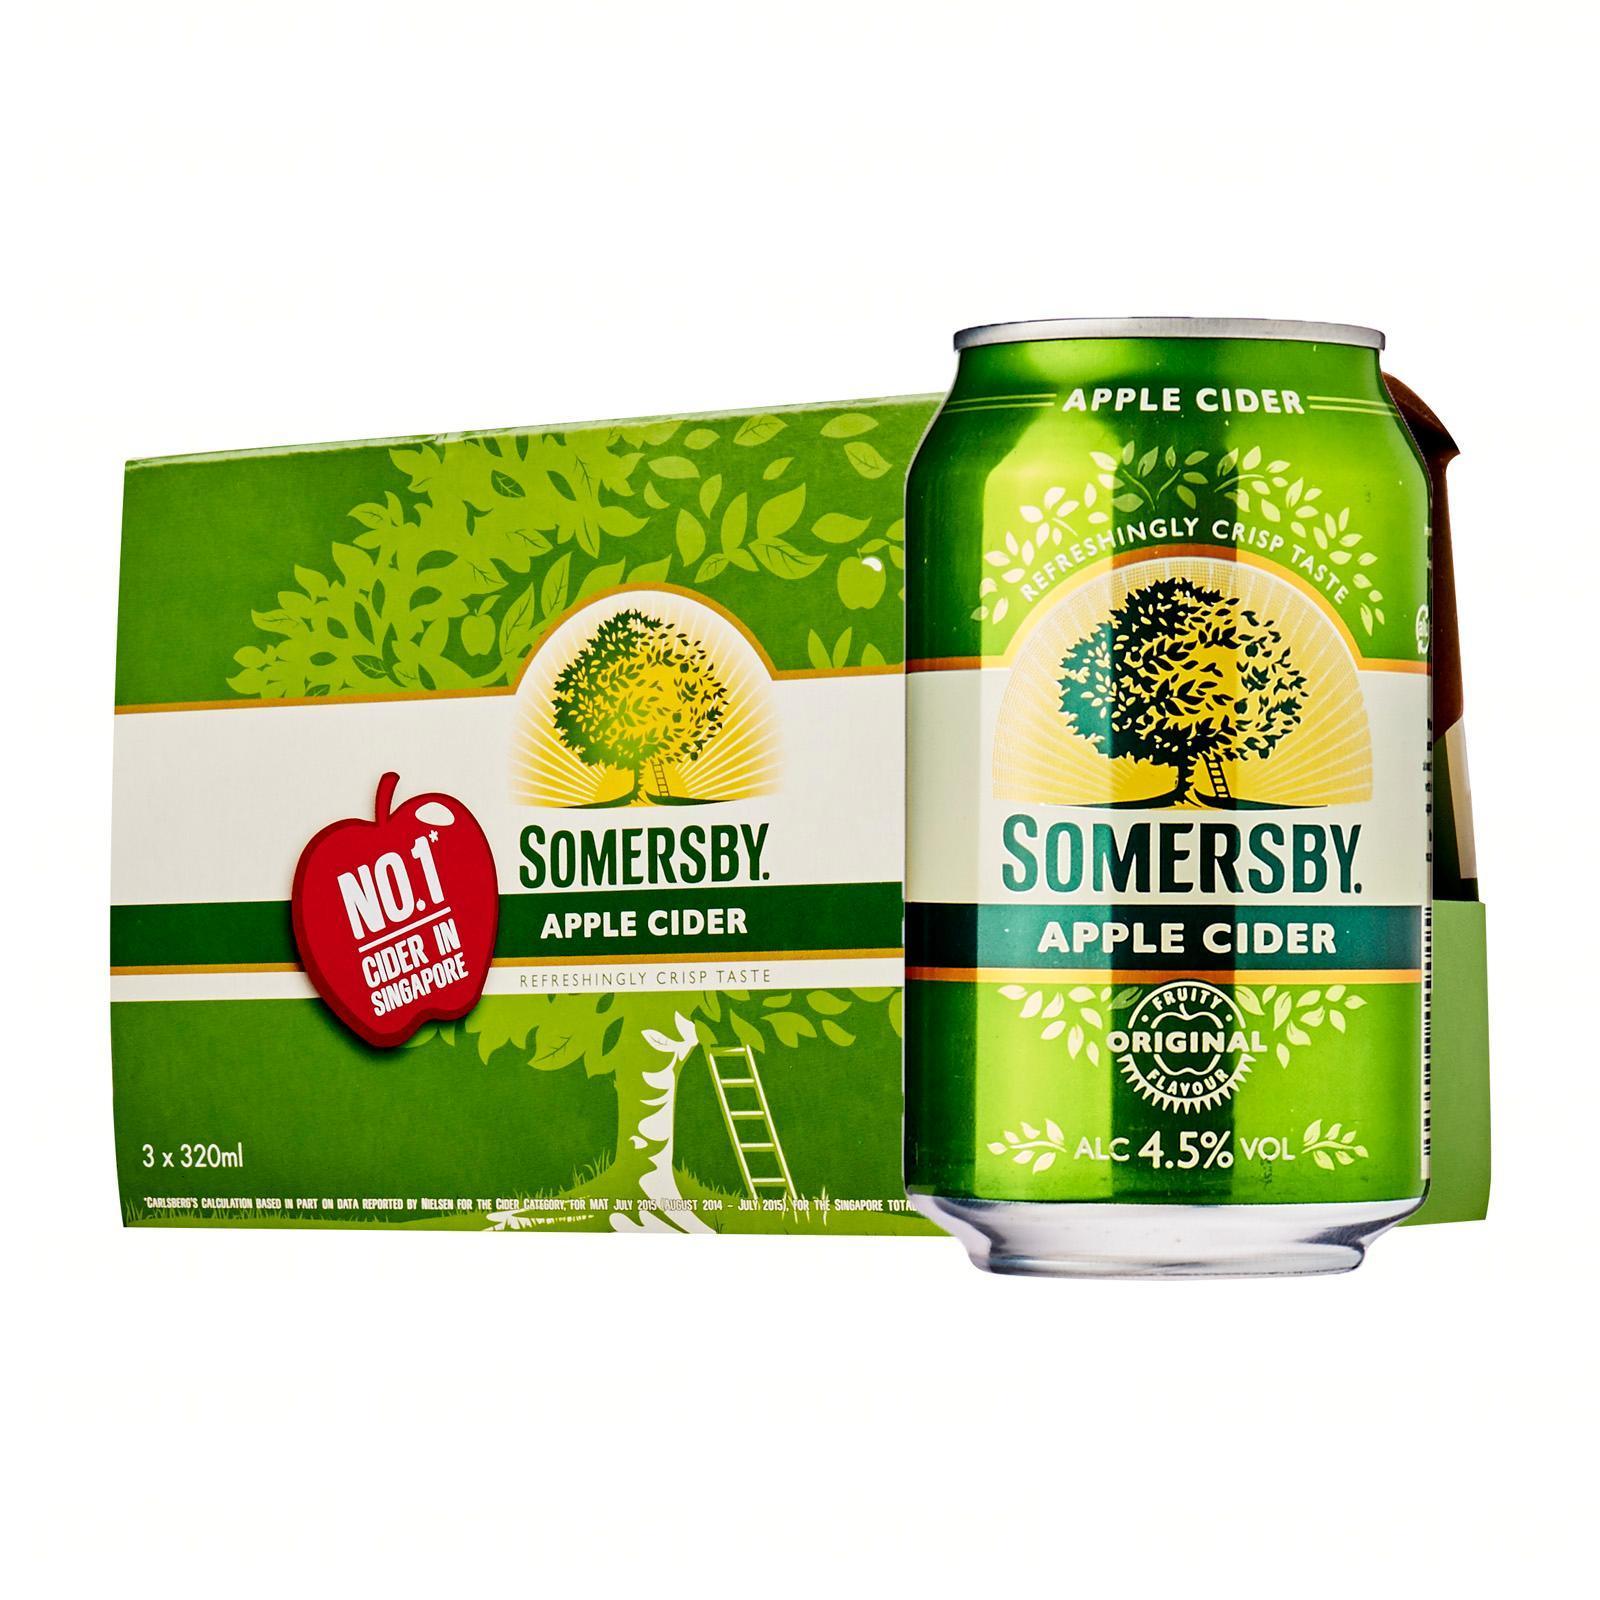 Somersby Apple Cider 3 X 320ml By Redmart.